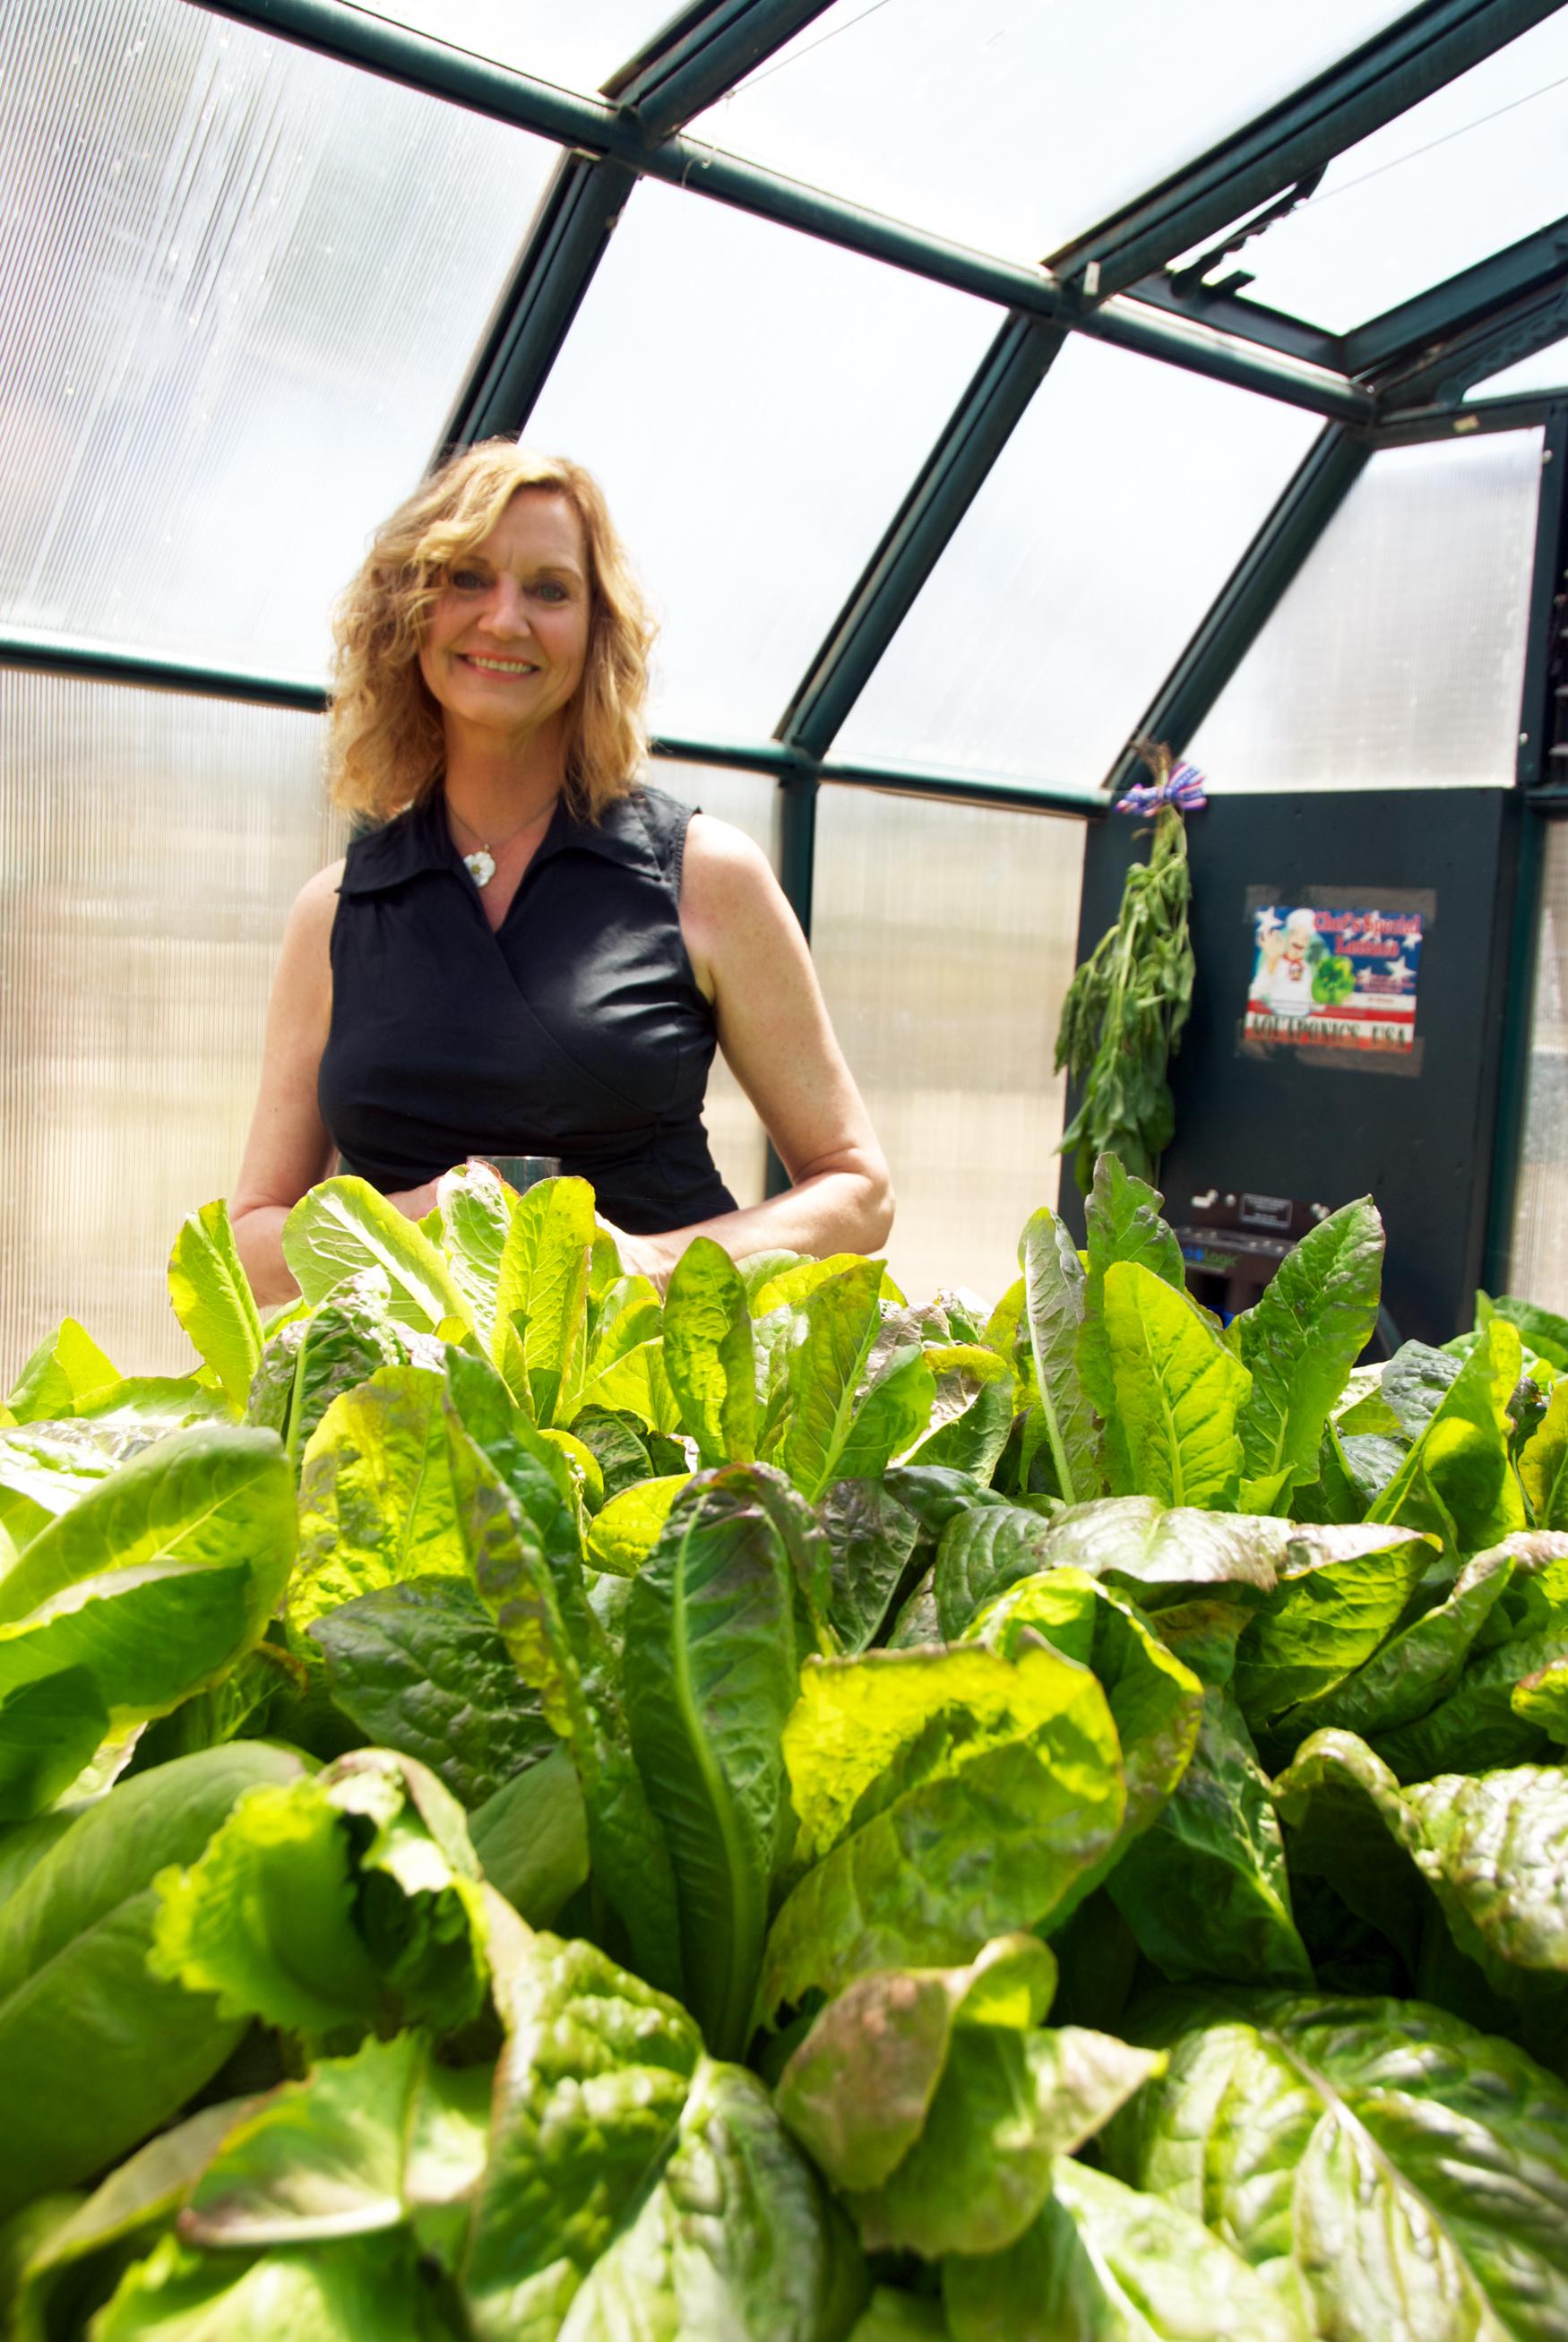 Sue of Sue's Health Foods Store behind Grow Bed #4 verticle